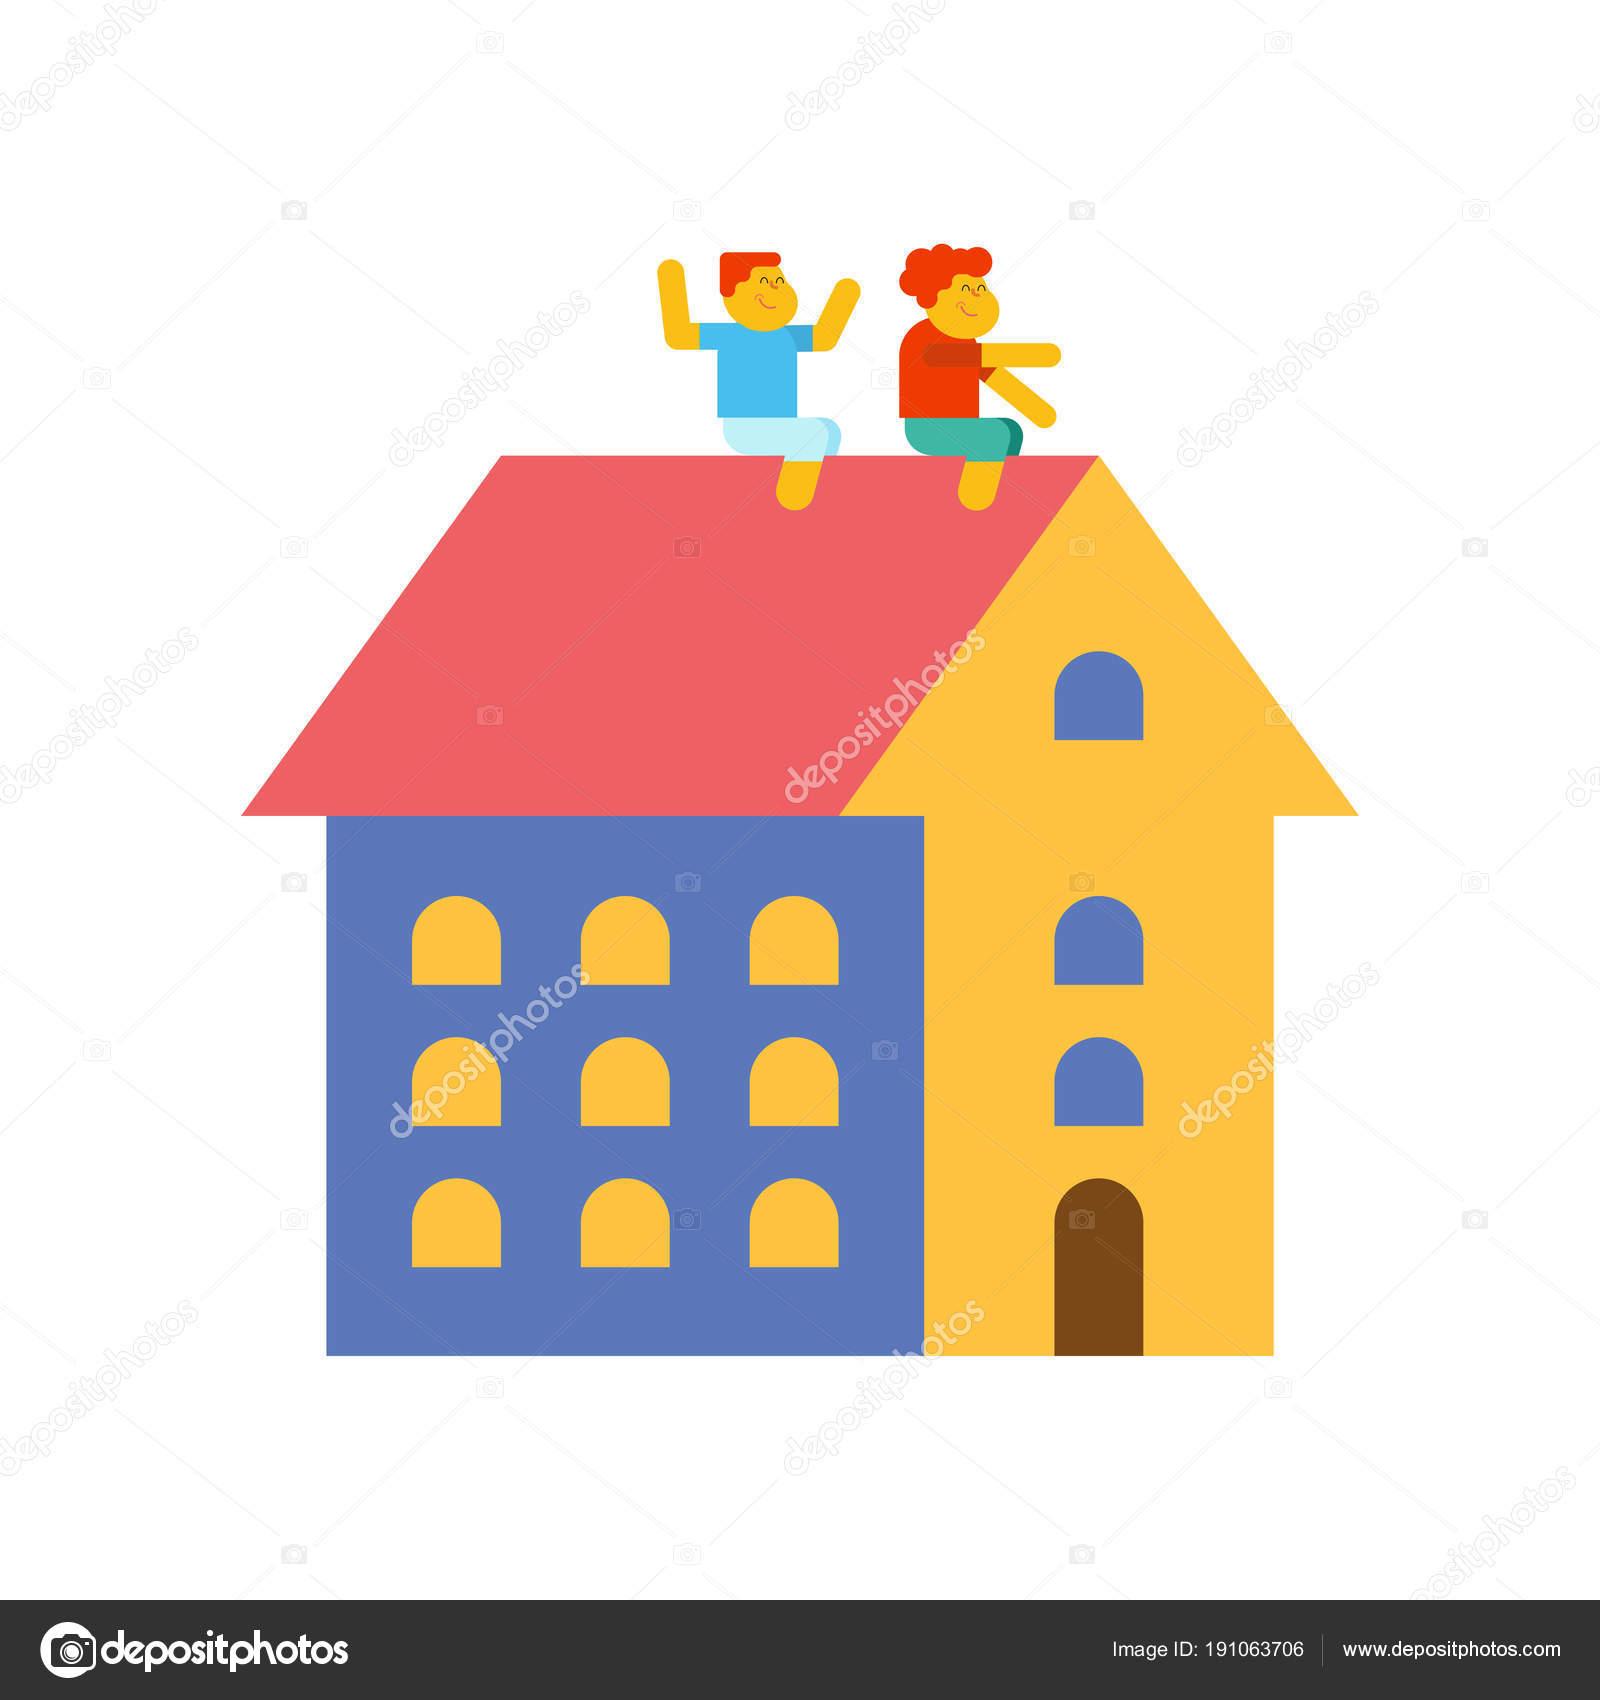 Kinder Spielen Am Dach Des Hauses. Vektor Illustration U2014 Stockvektor